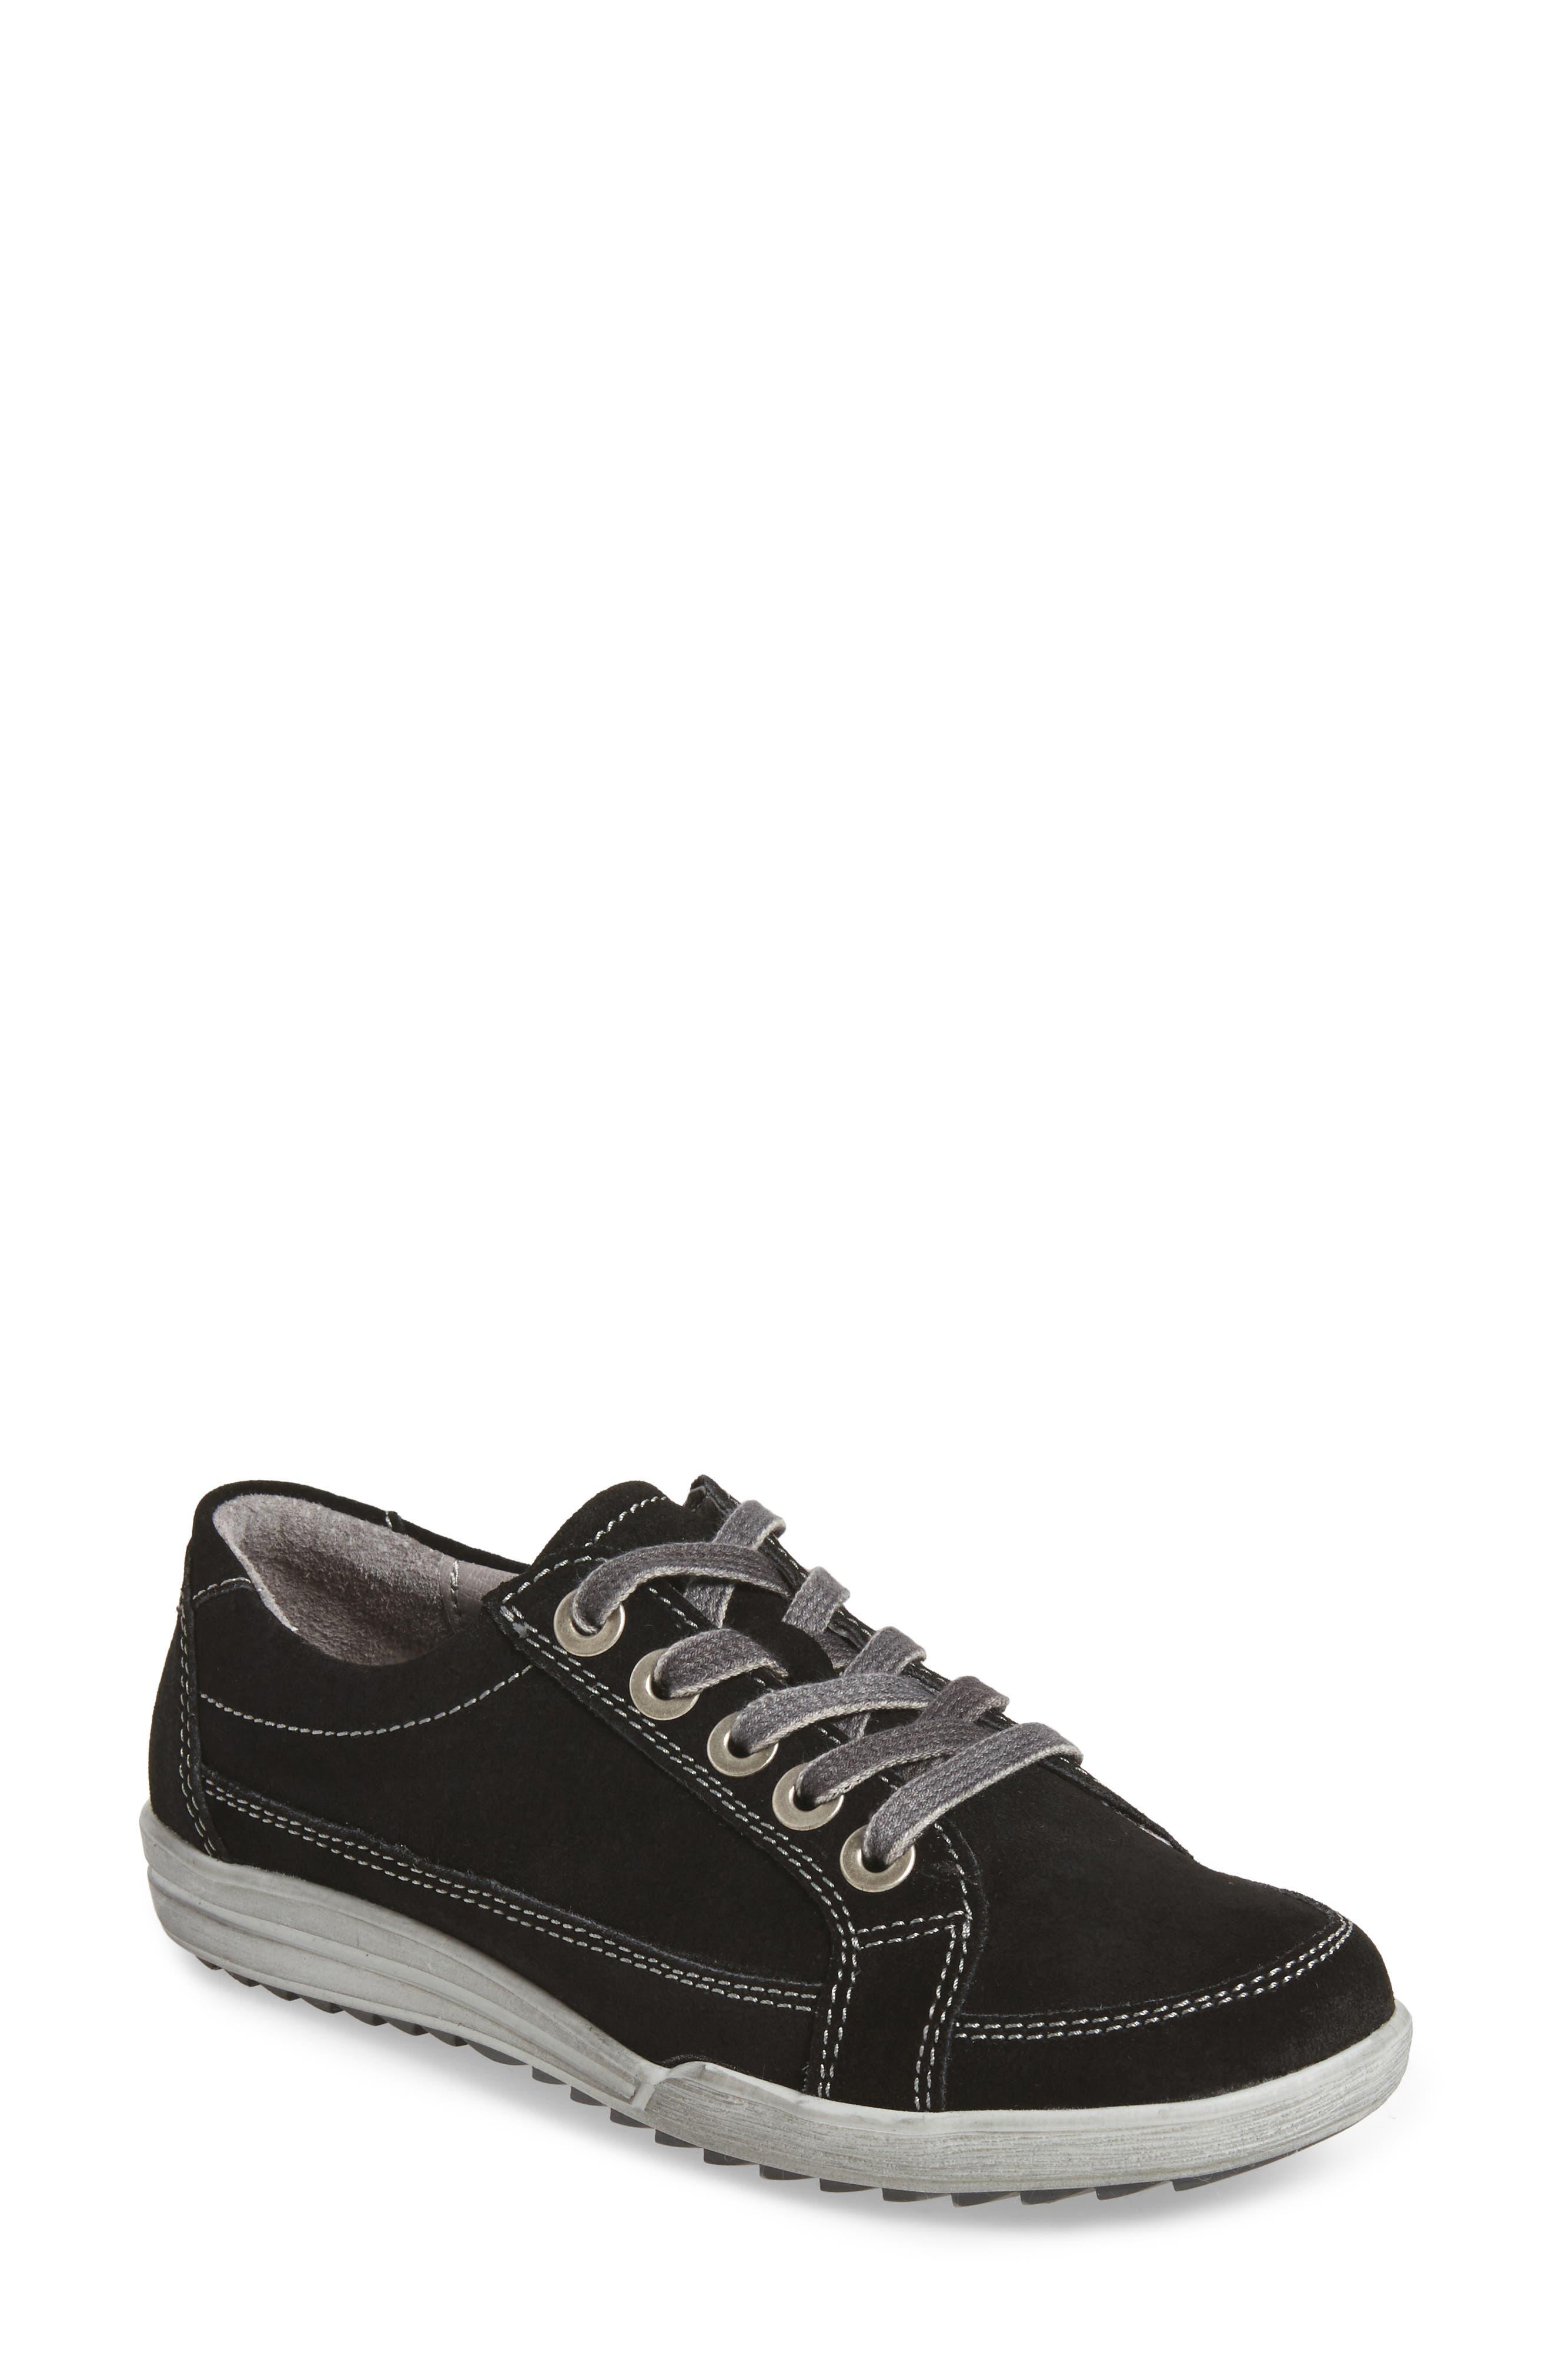 Dany 57 Sneaker,                             Main thumbnail 1, color,                             Black Leather